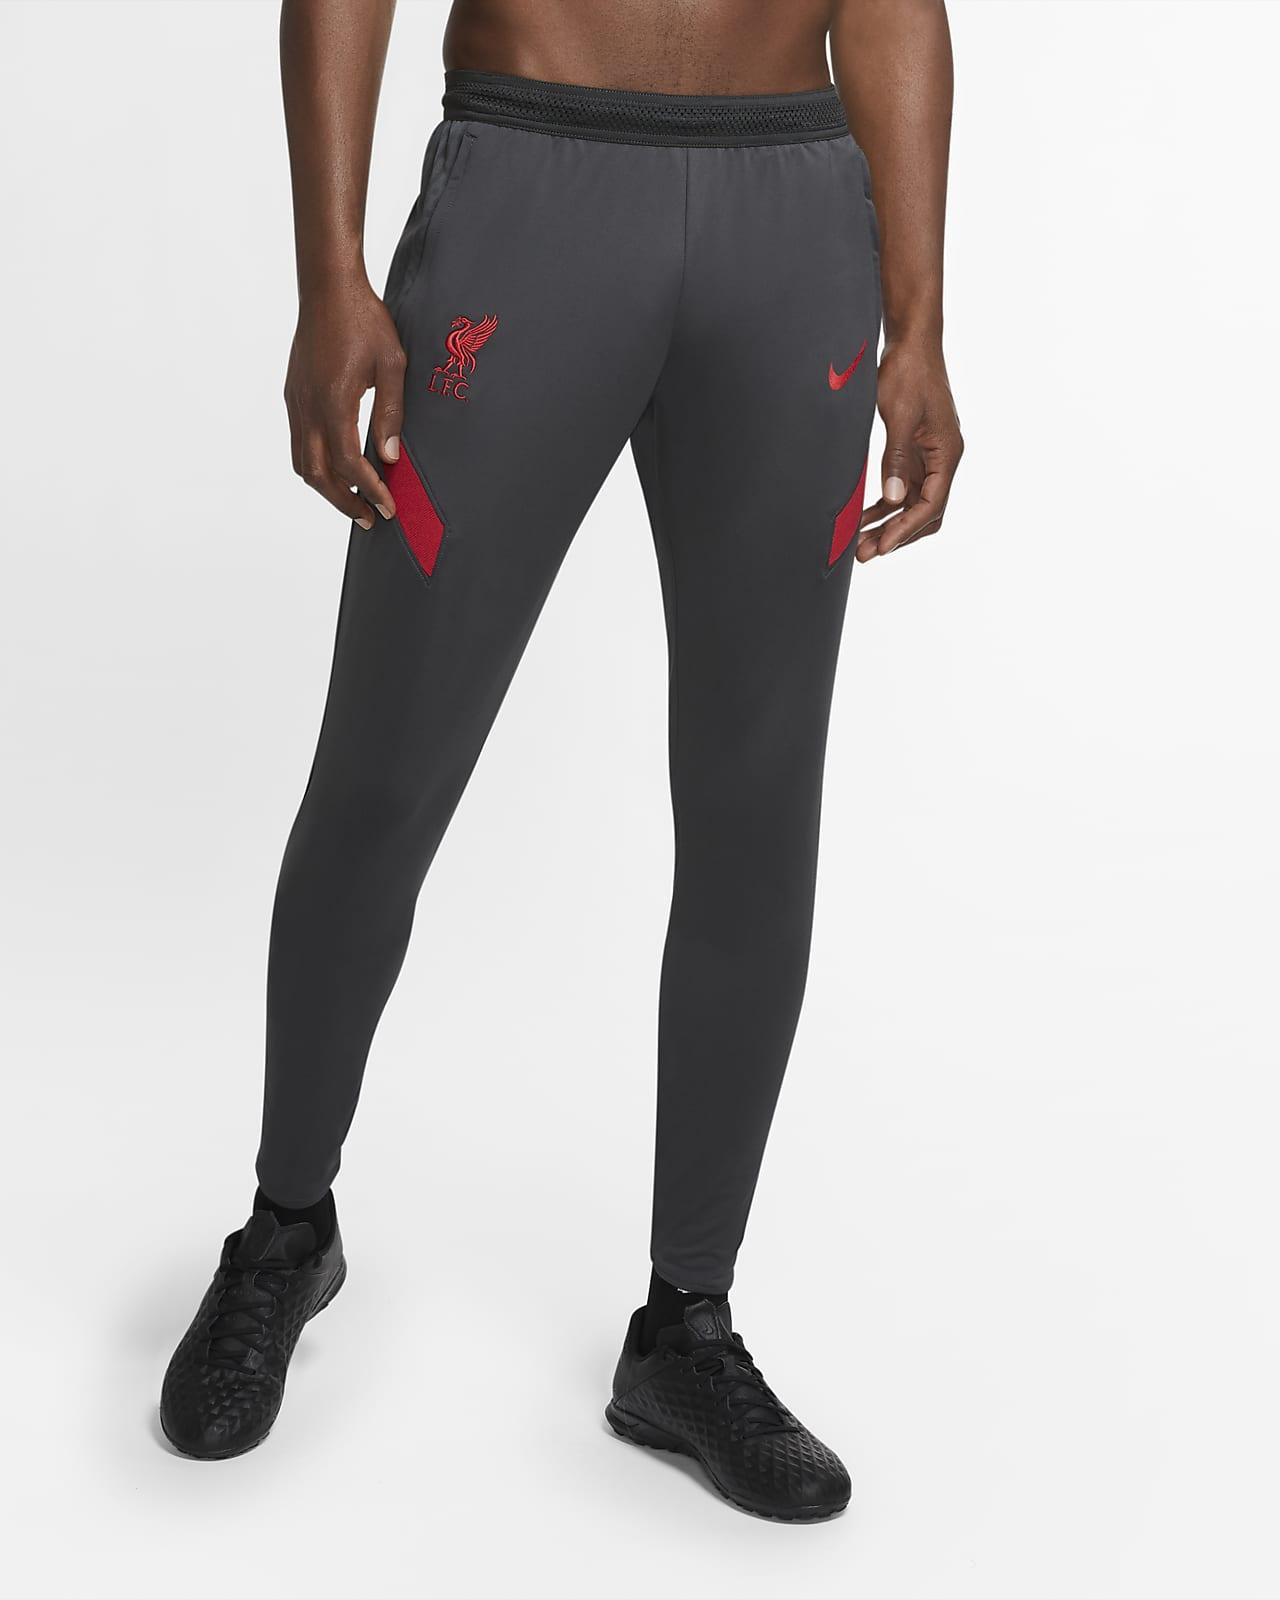 Pantalones de fútbol tejidos para hombre Liverpool FC Strike